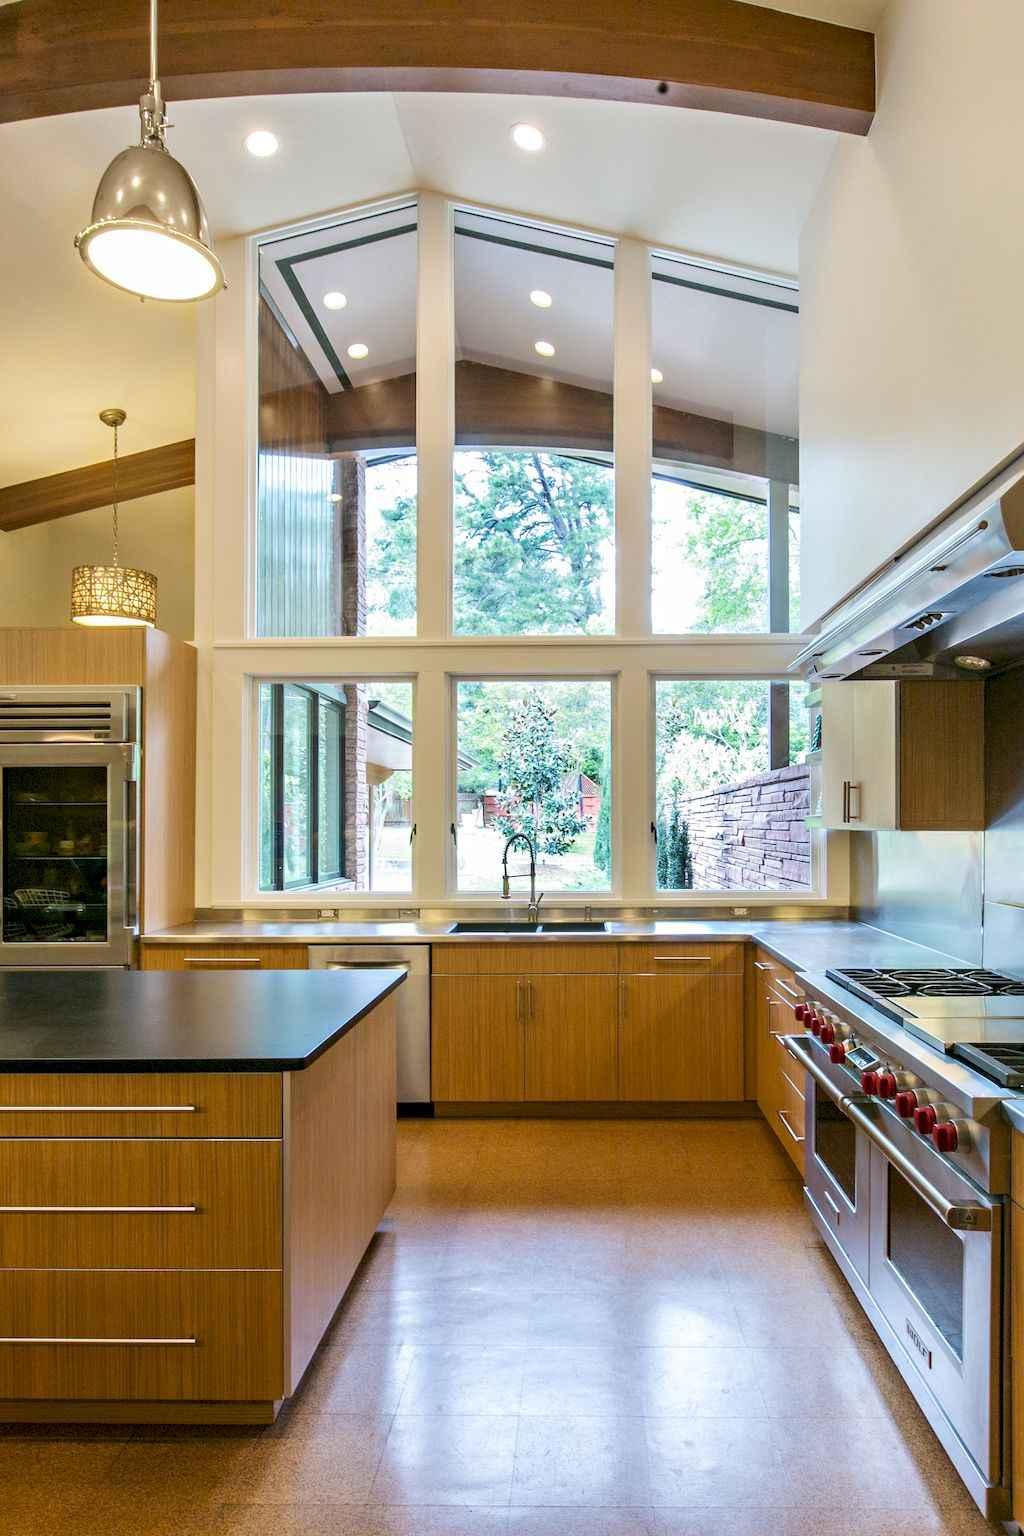 Mid century modern kitchen design ideas (9)